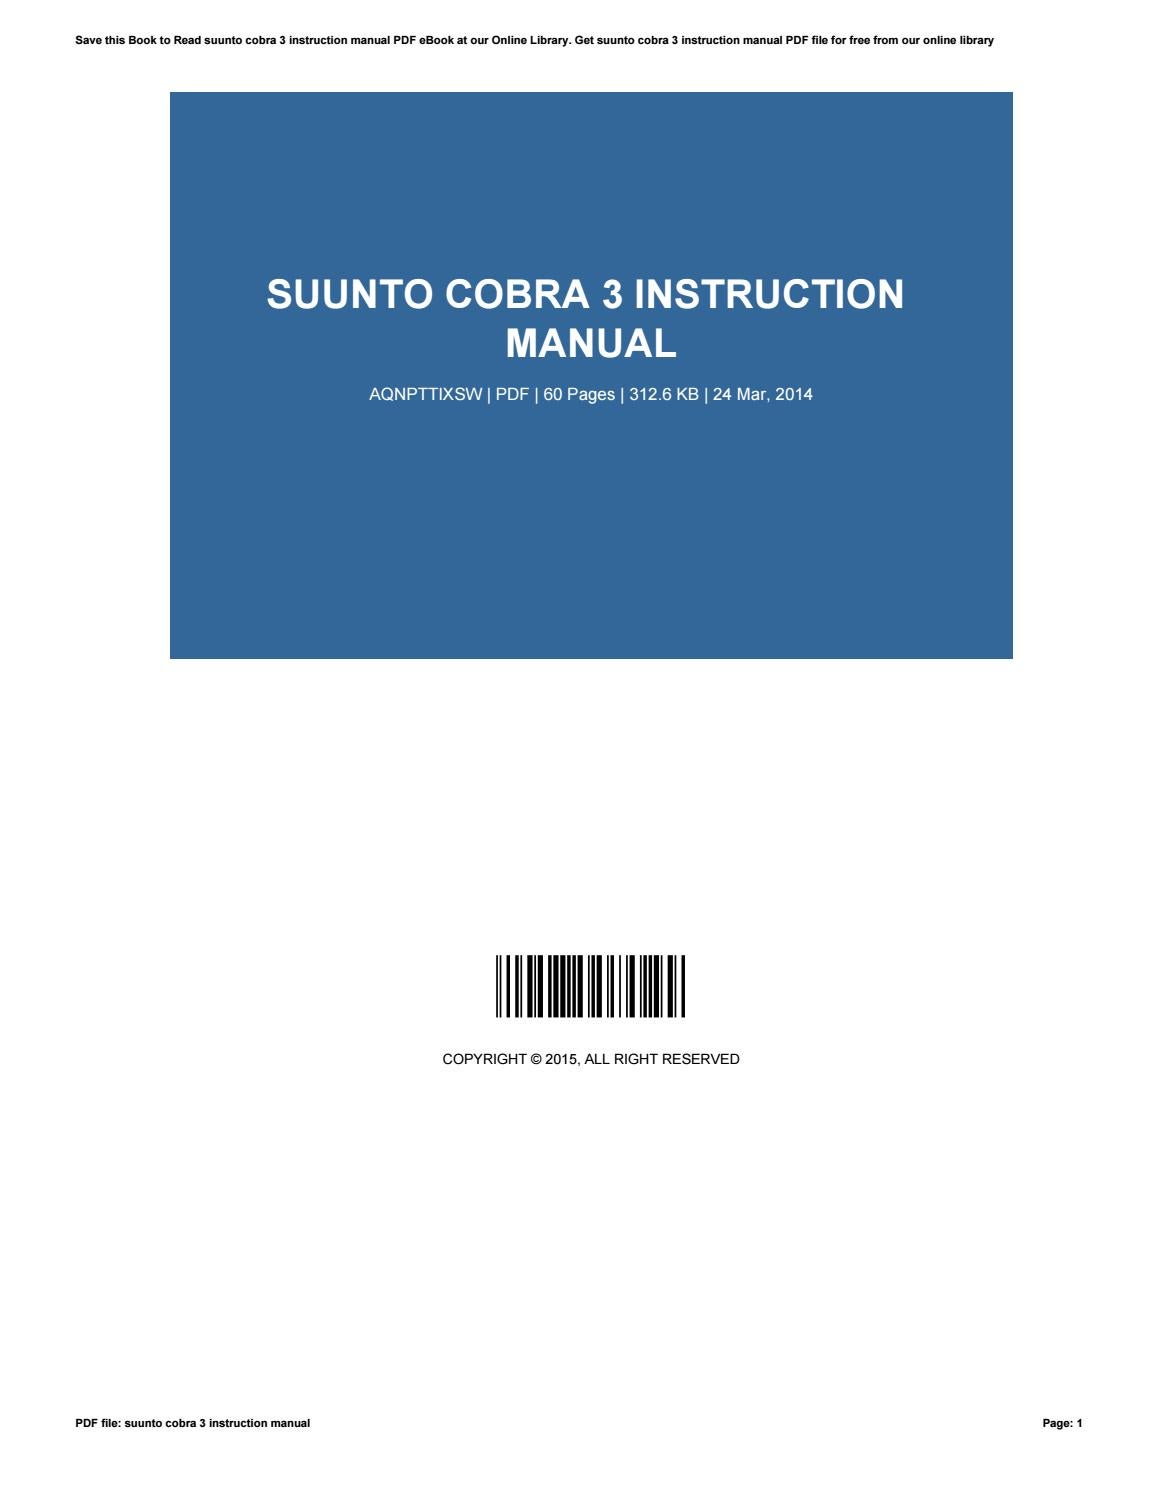 suunto cobra 3 user manual